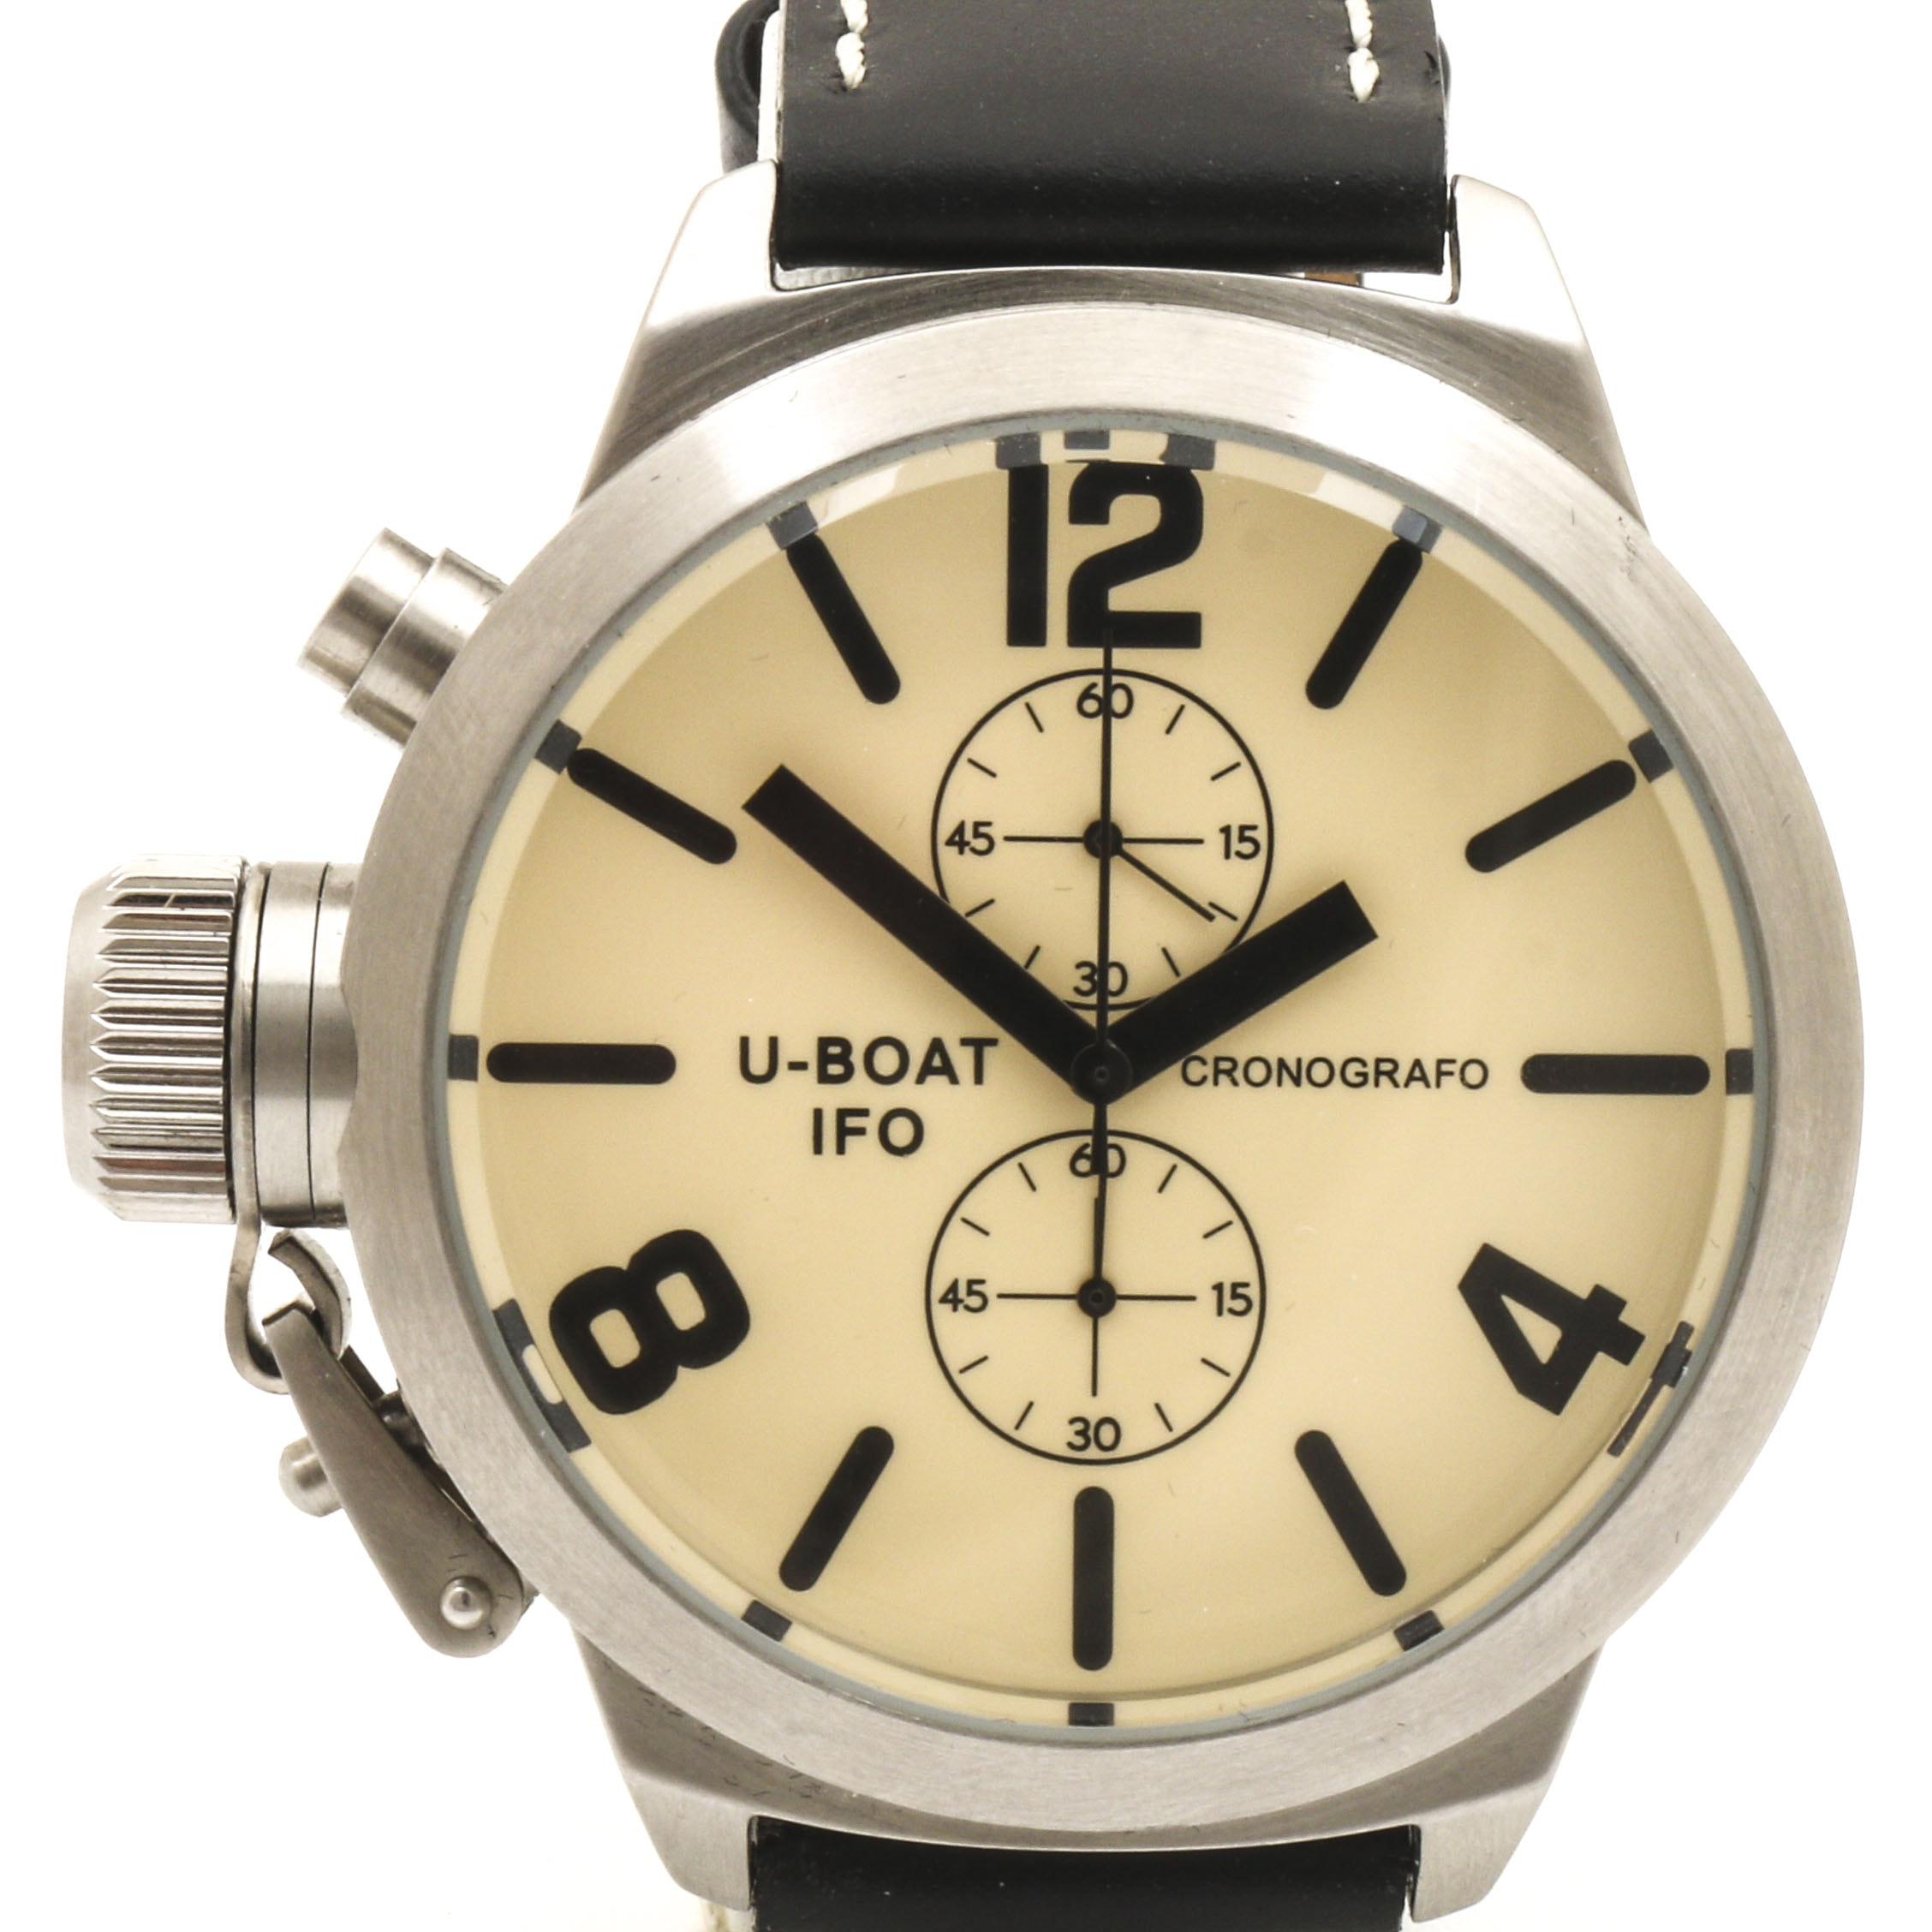 U - Boat IFO Leather Band Wristwatch